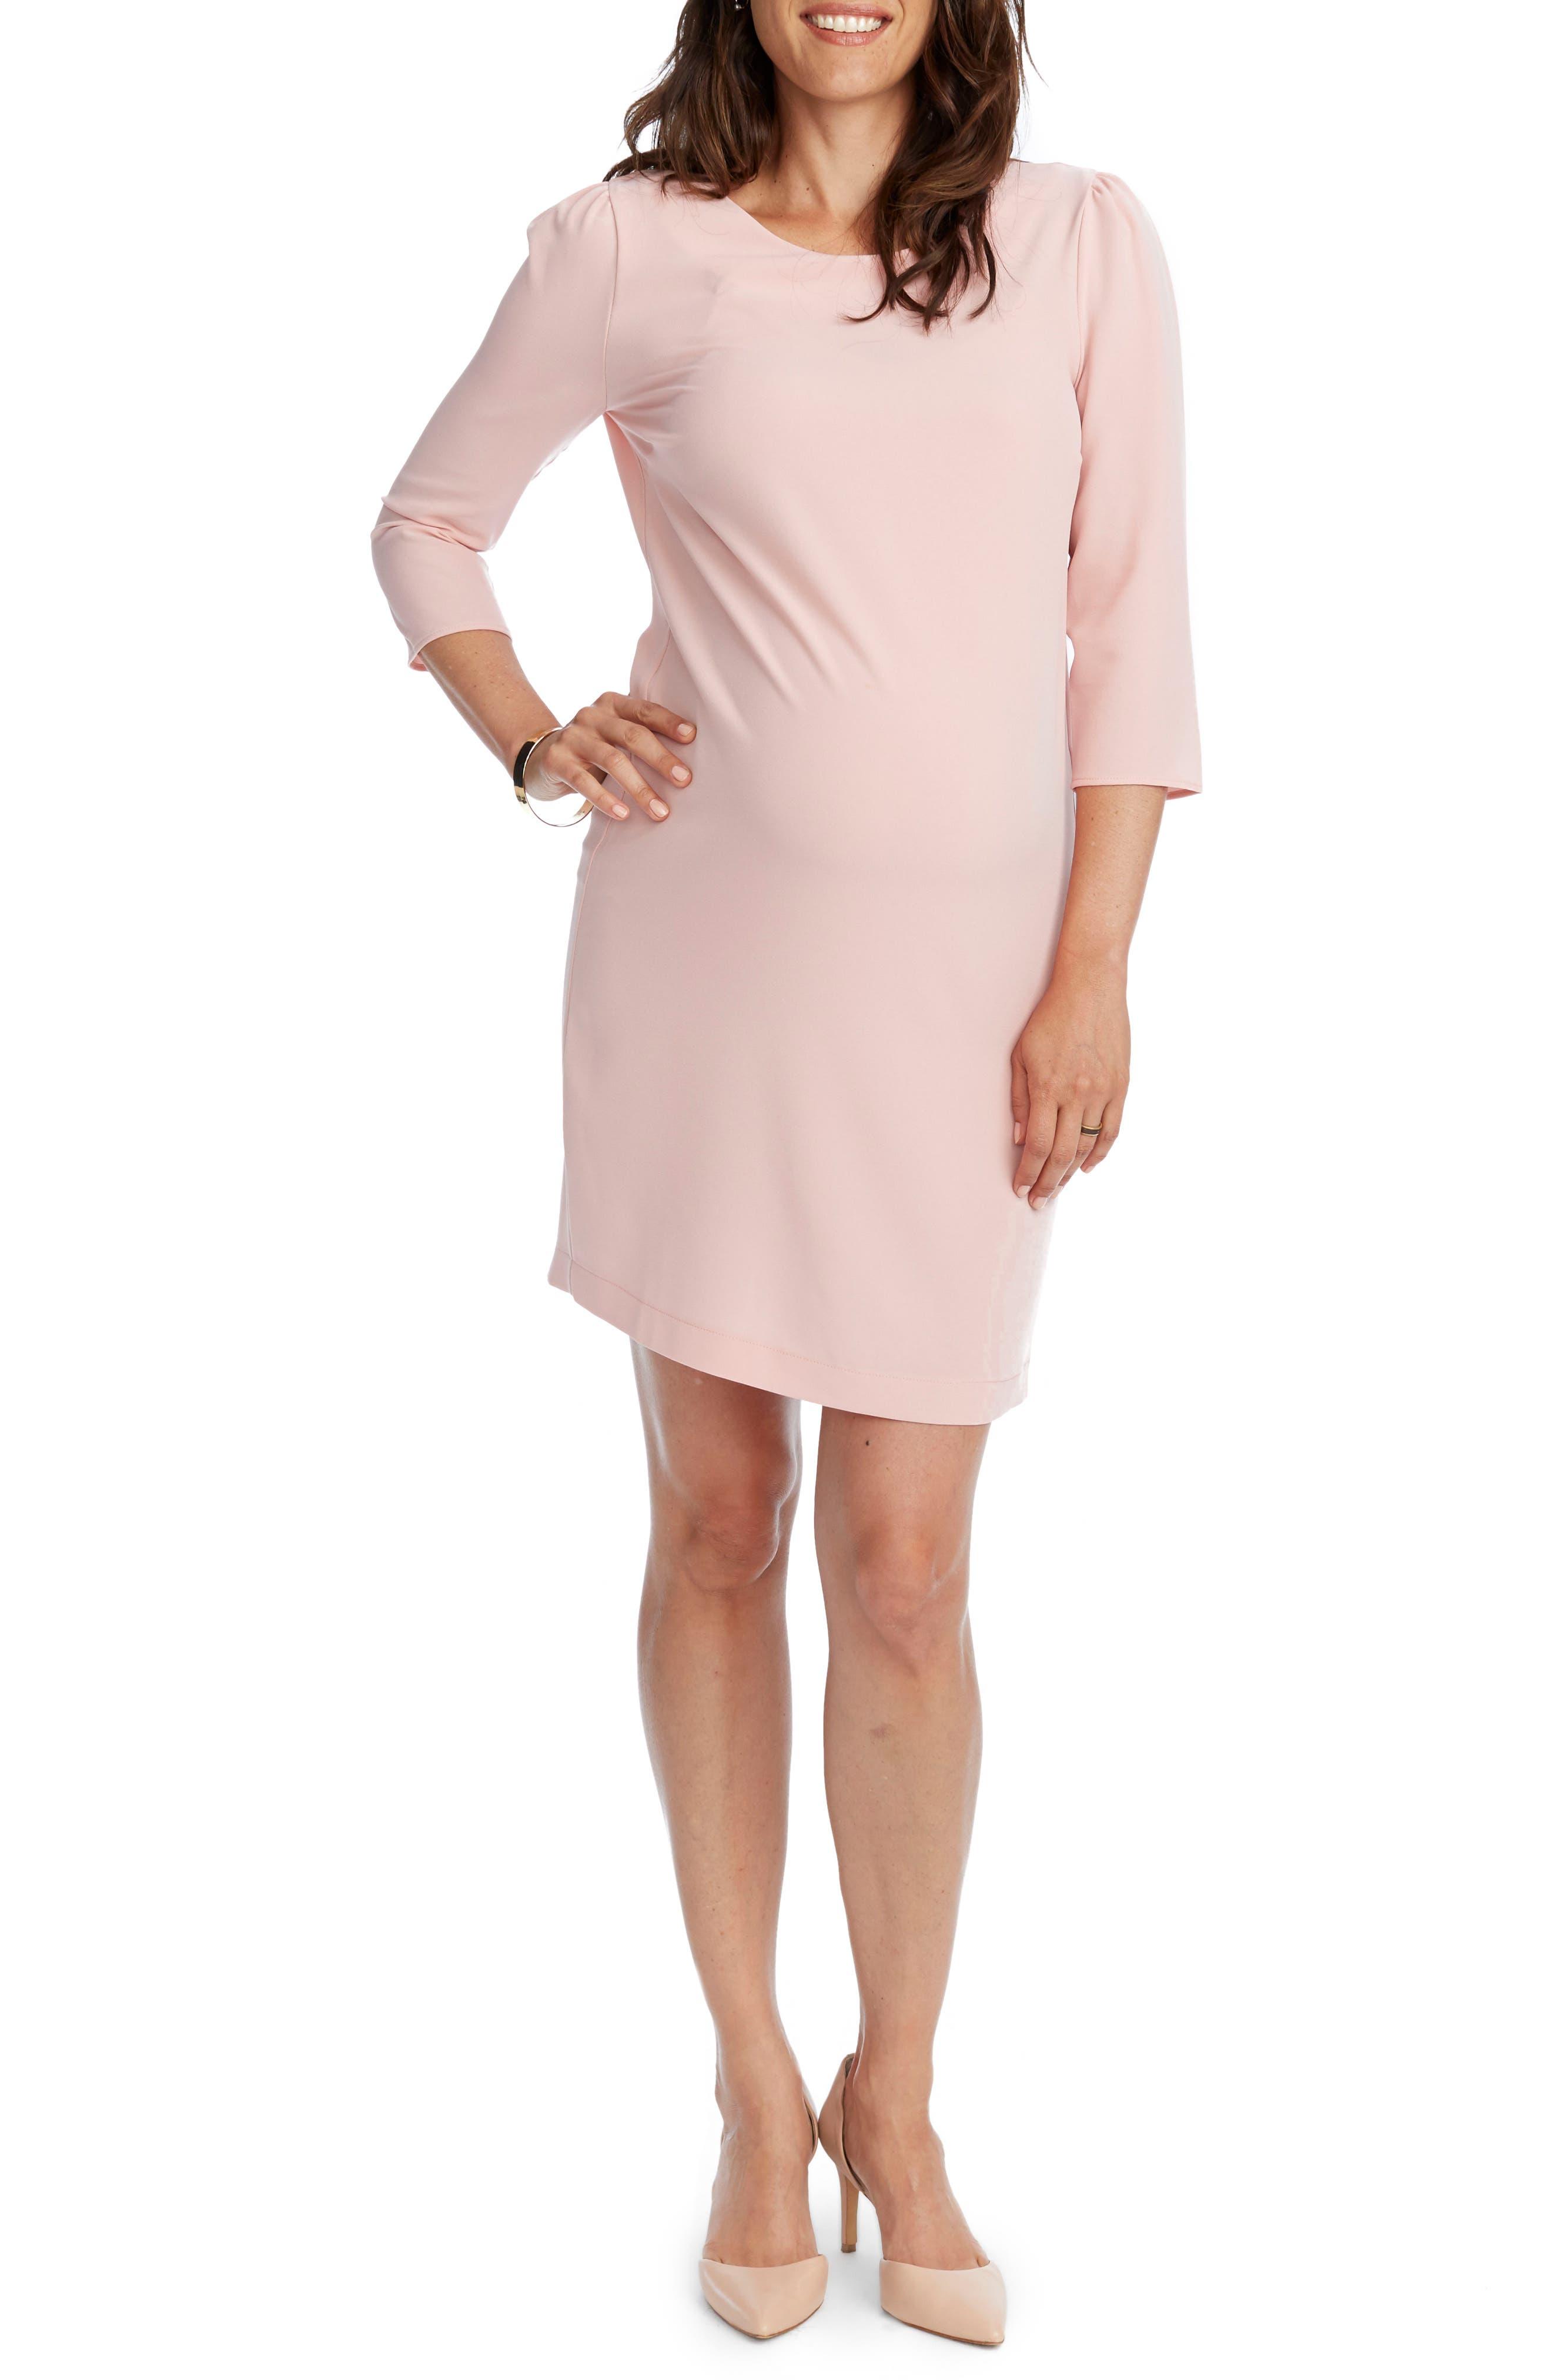 Cammie Maternity Shift Dress,                         Main,                         color, Blush